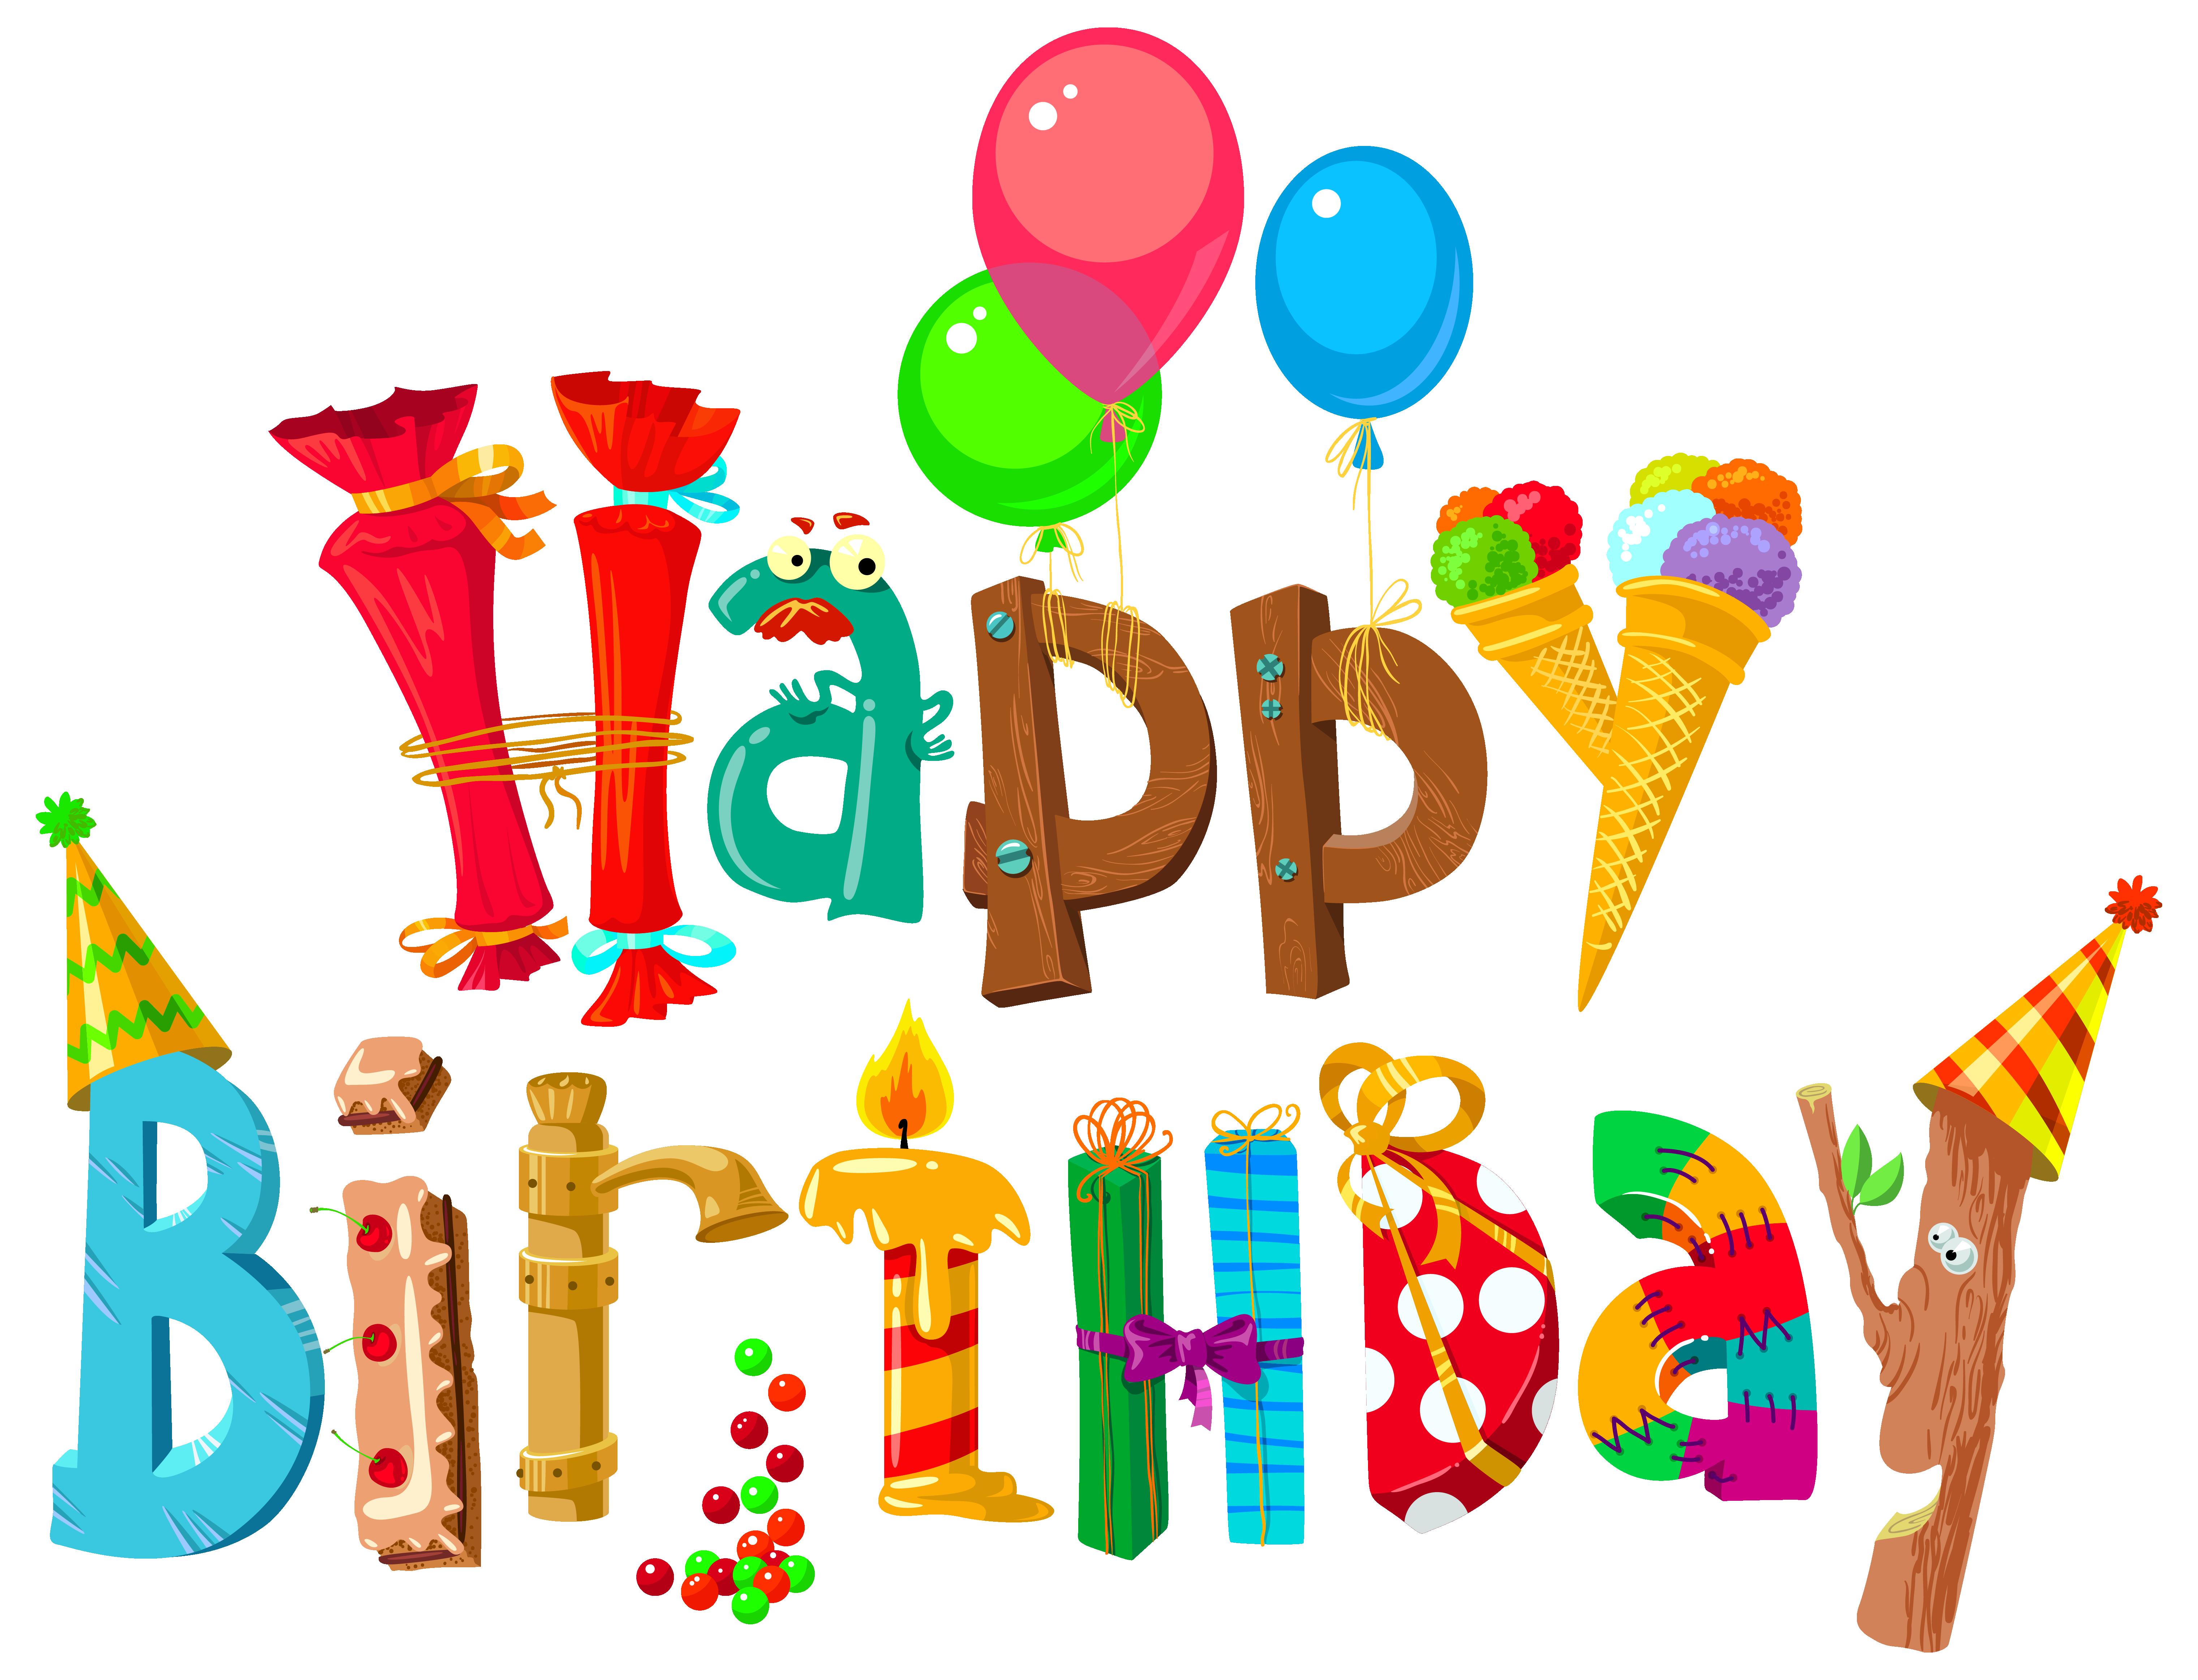 happy birthday clip art .-happy birthday clip art .-0